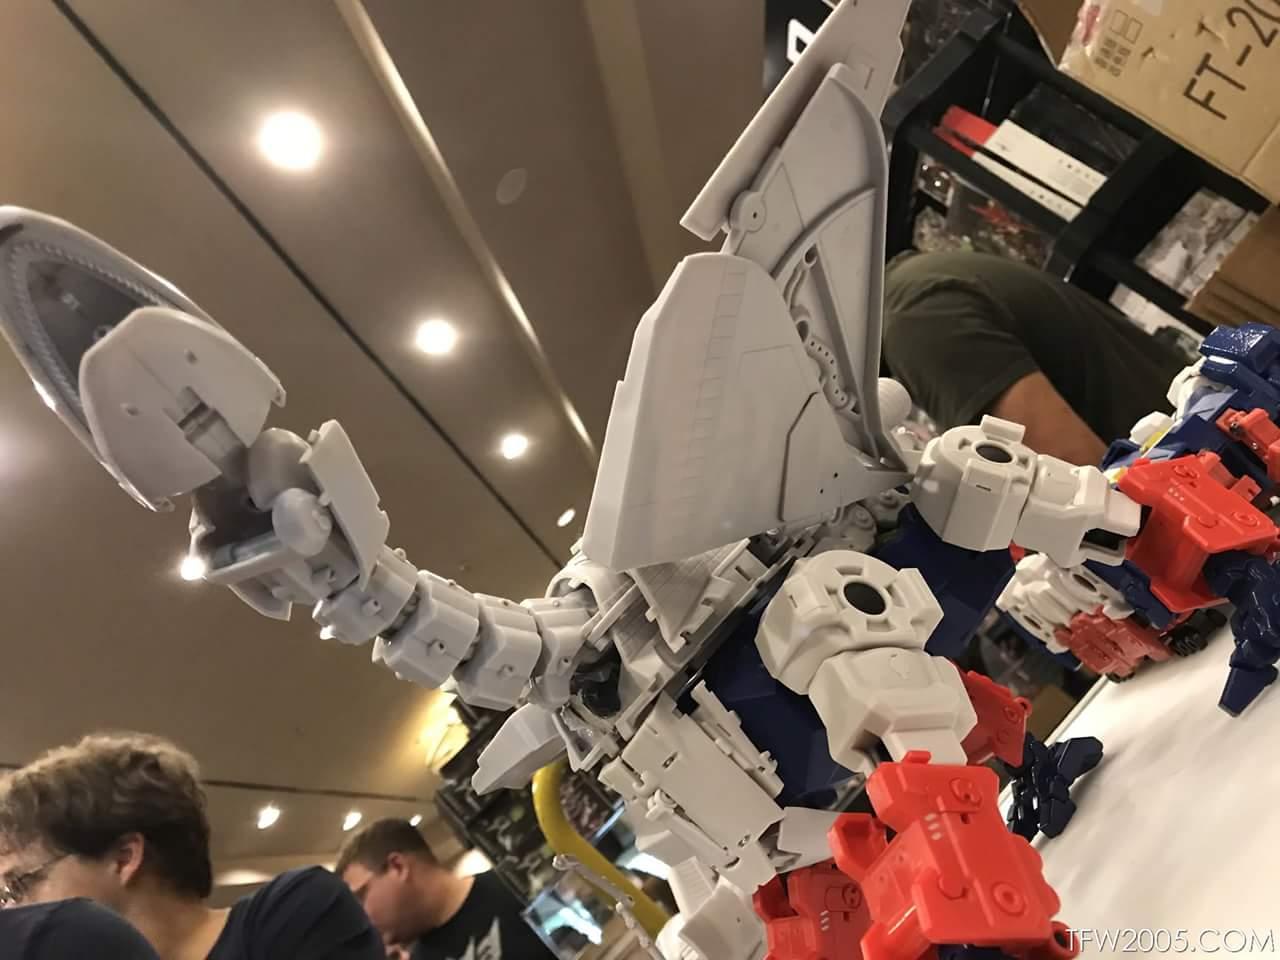 [Mastermind Creations] Produit Tiers - Reformatted Magna Inventa (R-35 Magna et R-36 Inventa) - aka Sky-Lynx/Chaînon QdkBSS8e_o